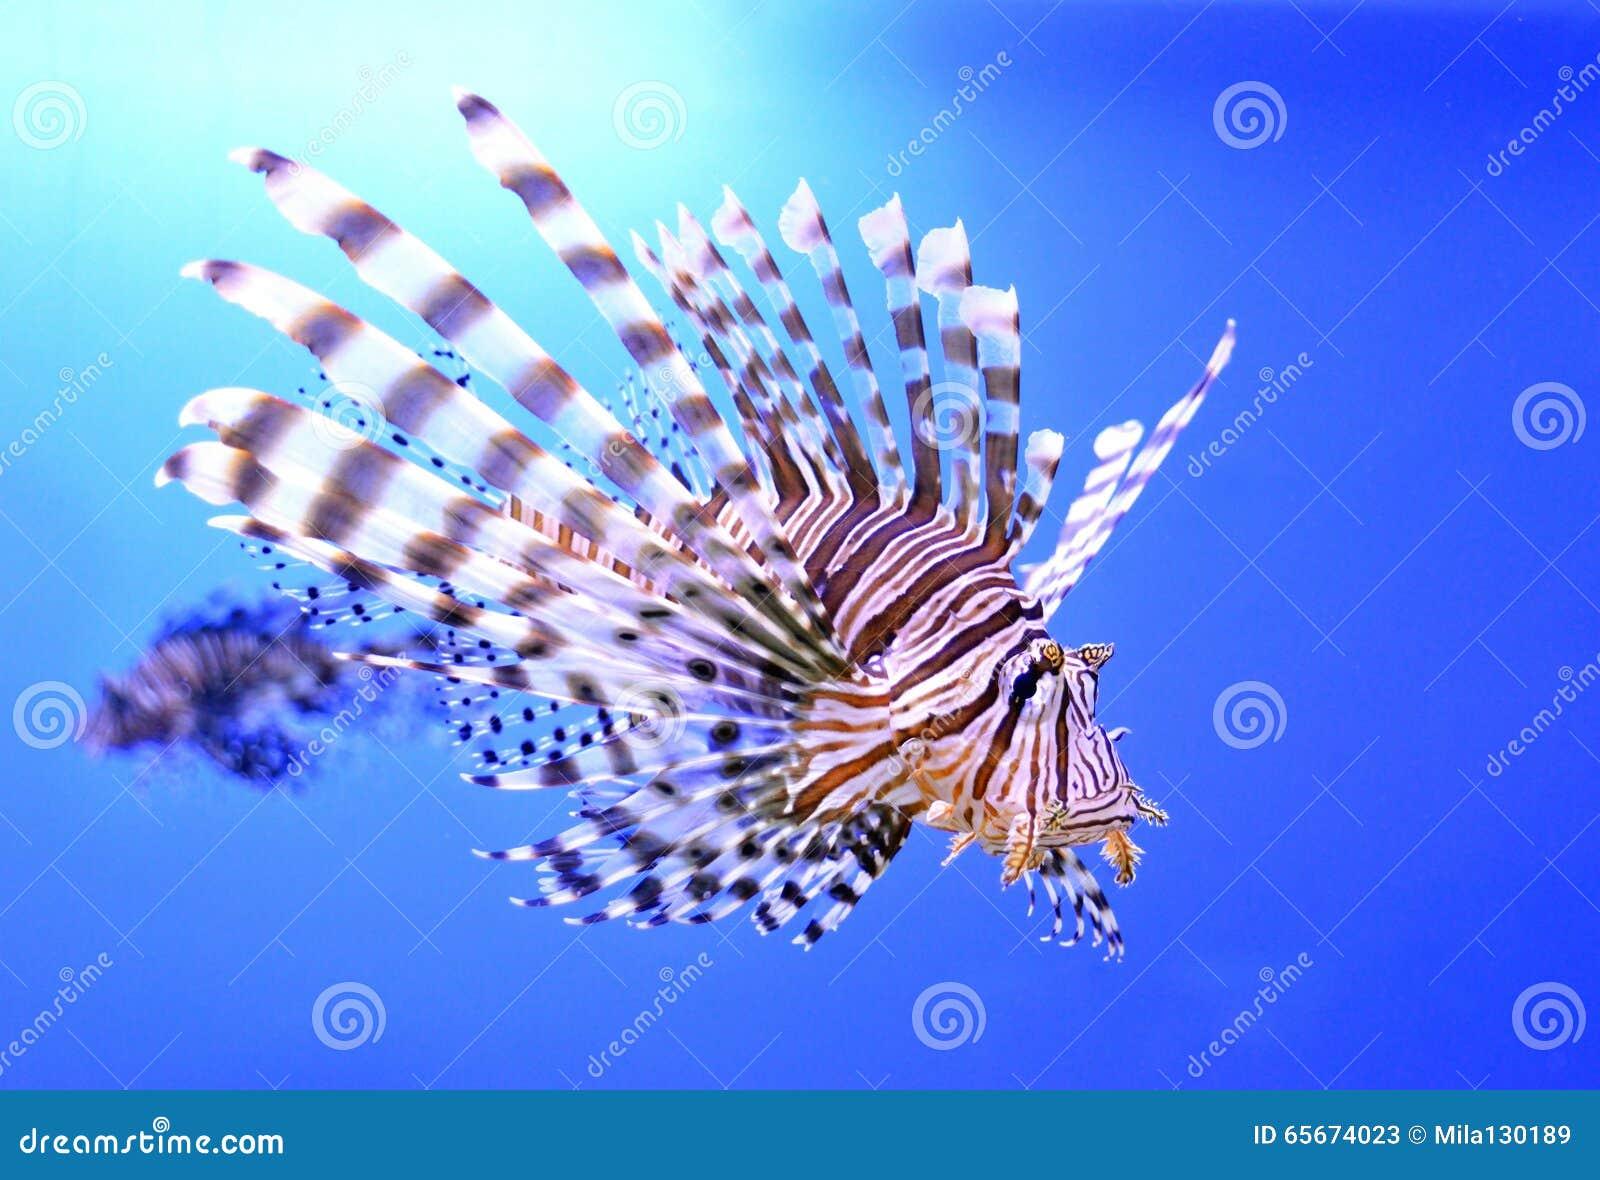 Beautiful Zebra Fish Or Striped Lionfish In The Aquarium Stock Image Image Of Saltwater Exotic 65674023